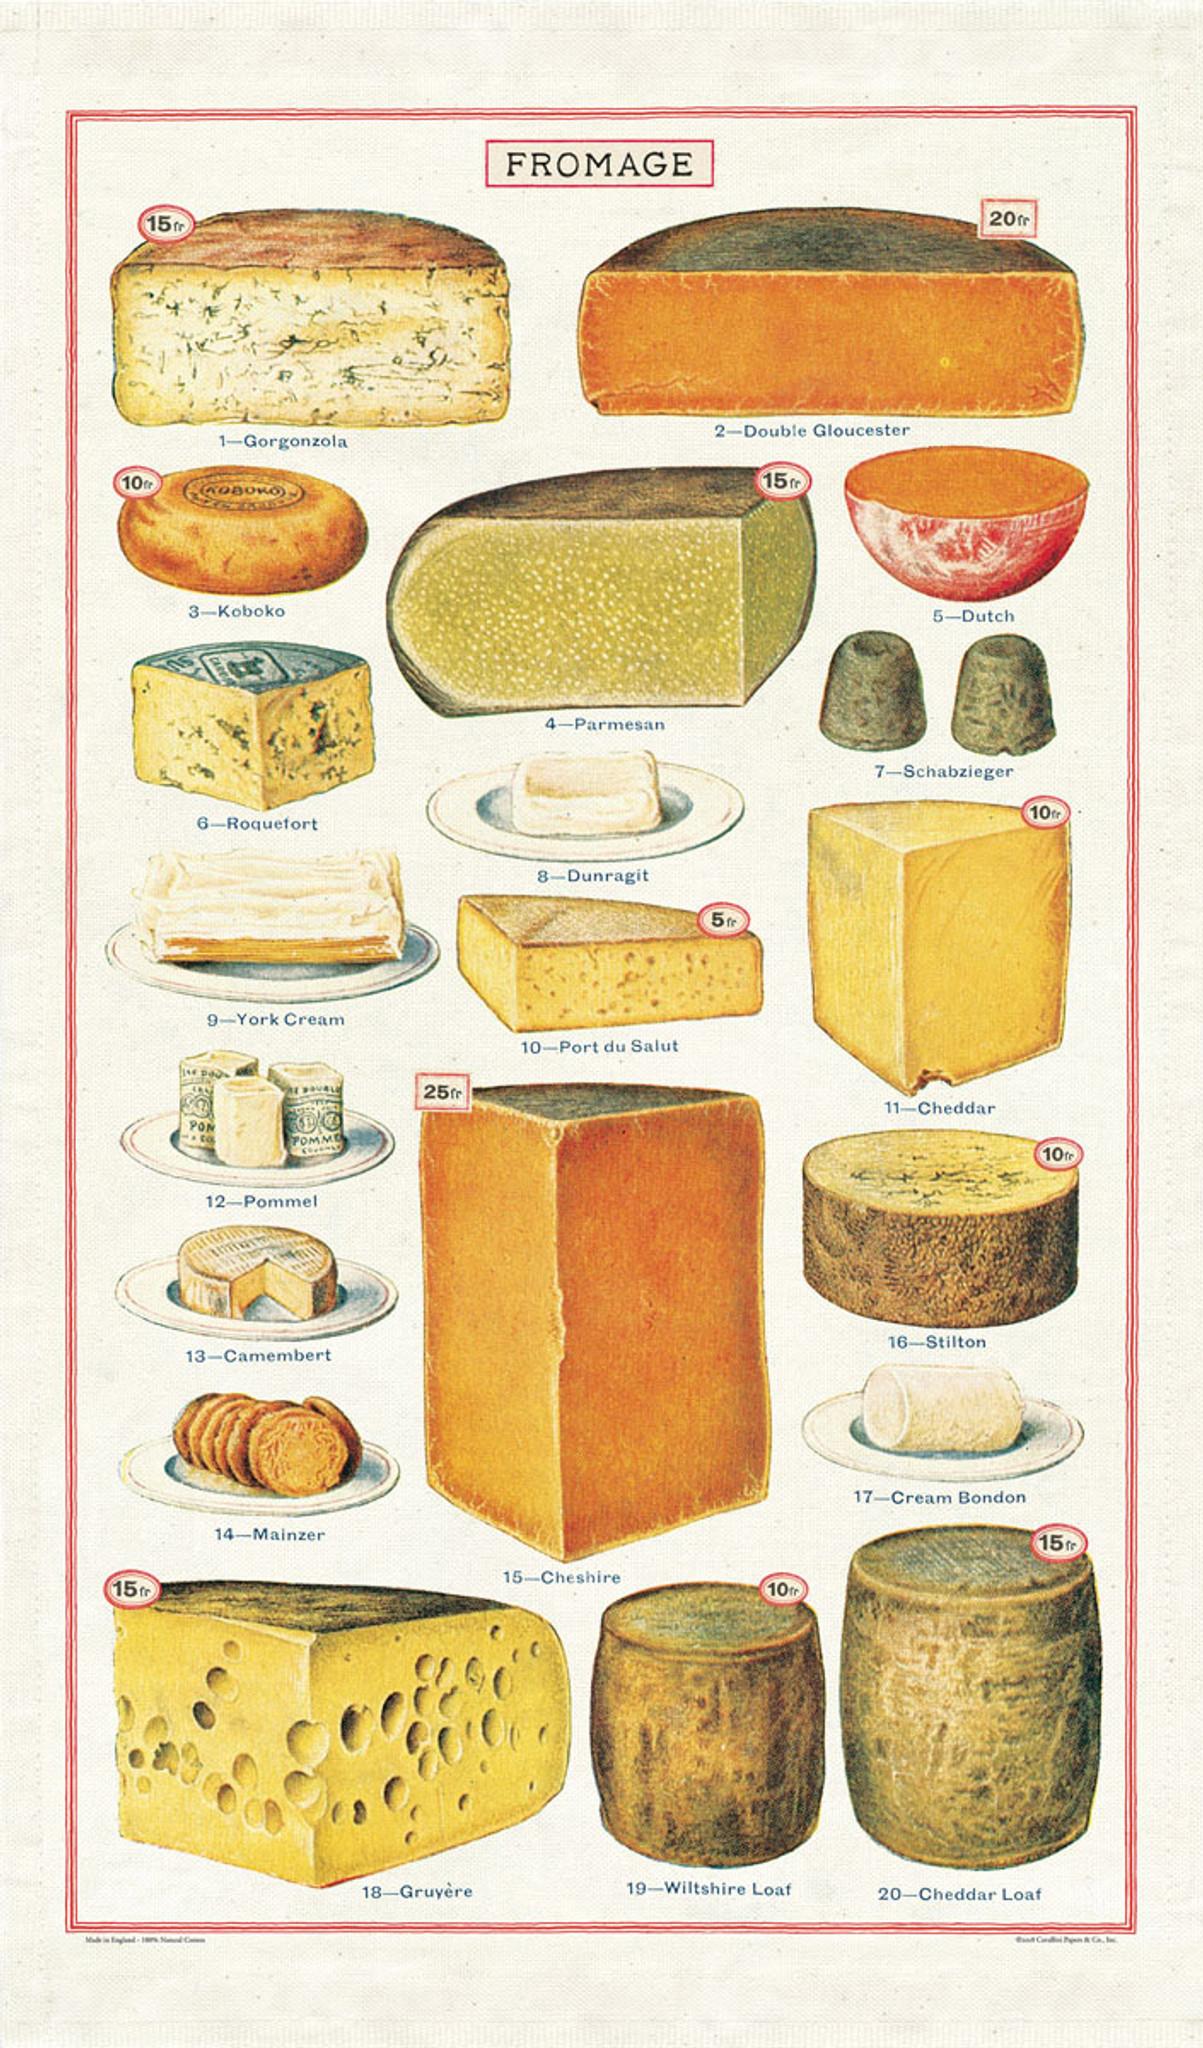 Tea Towel - Cheese